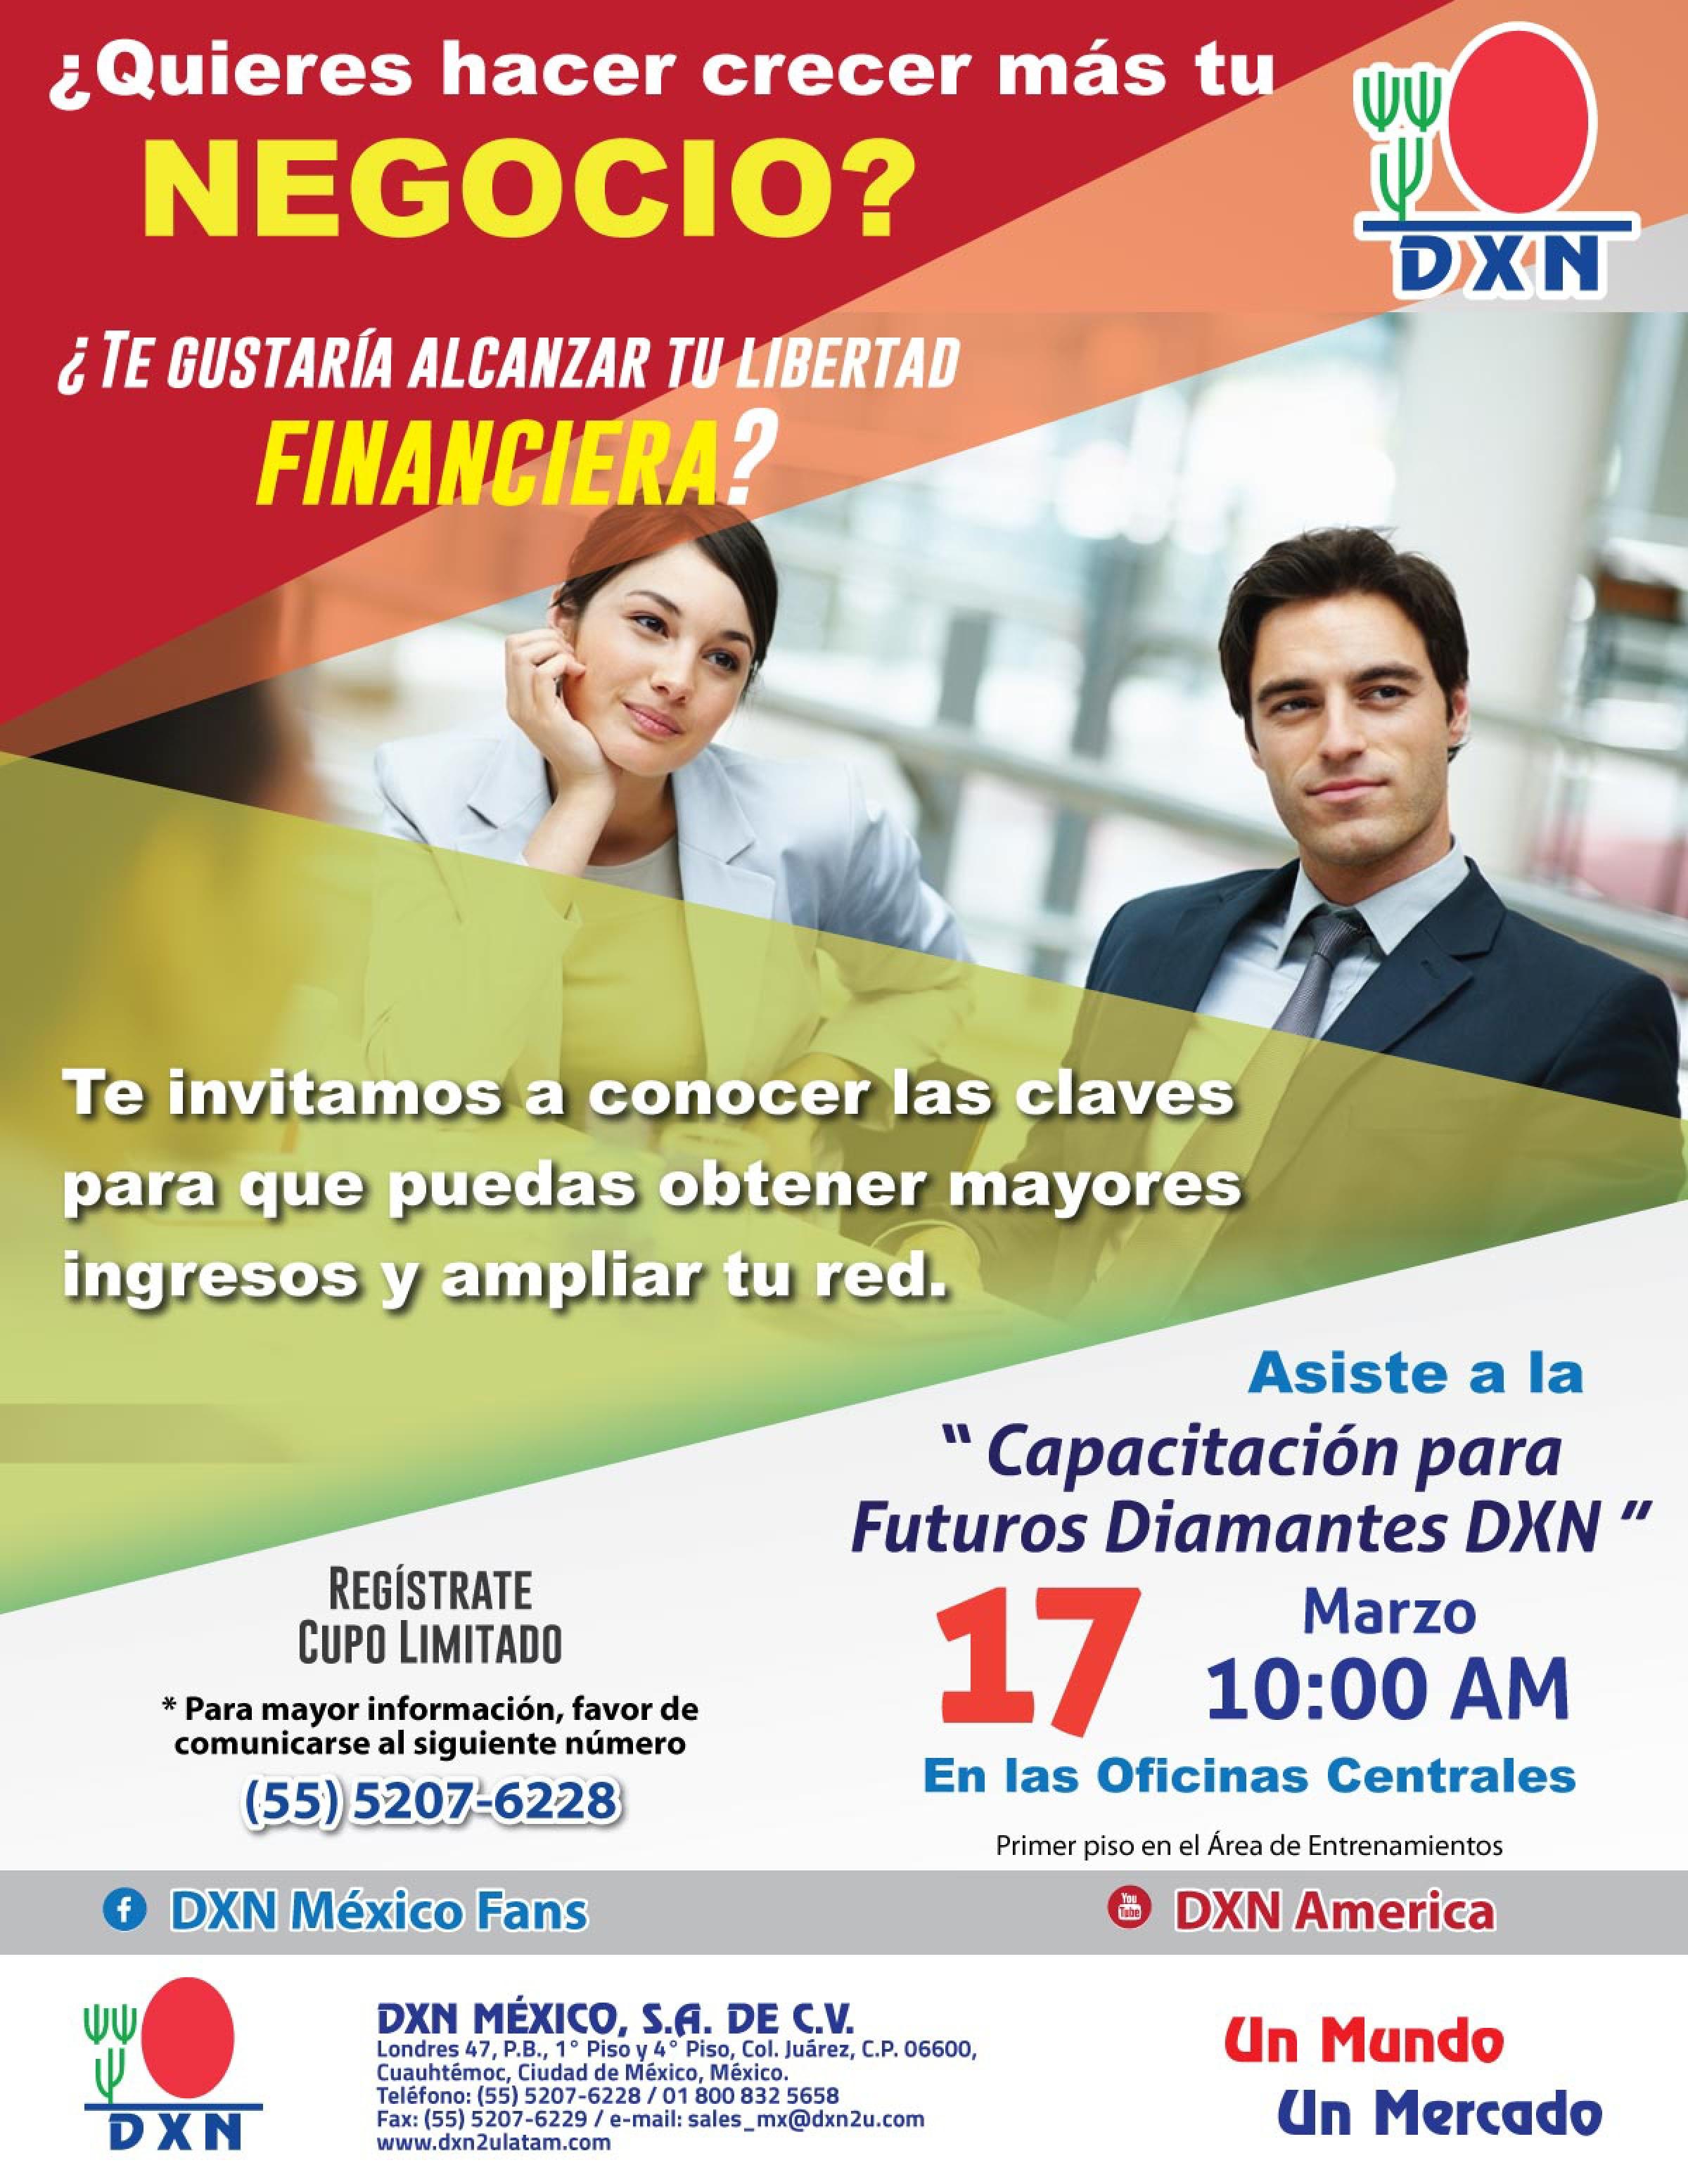 DXN México